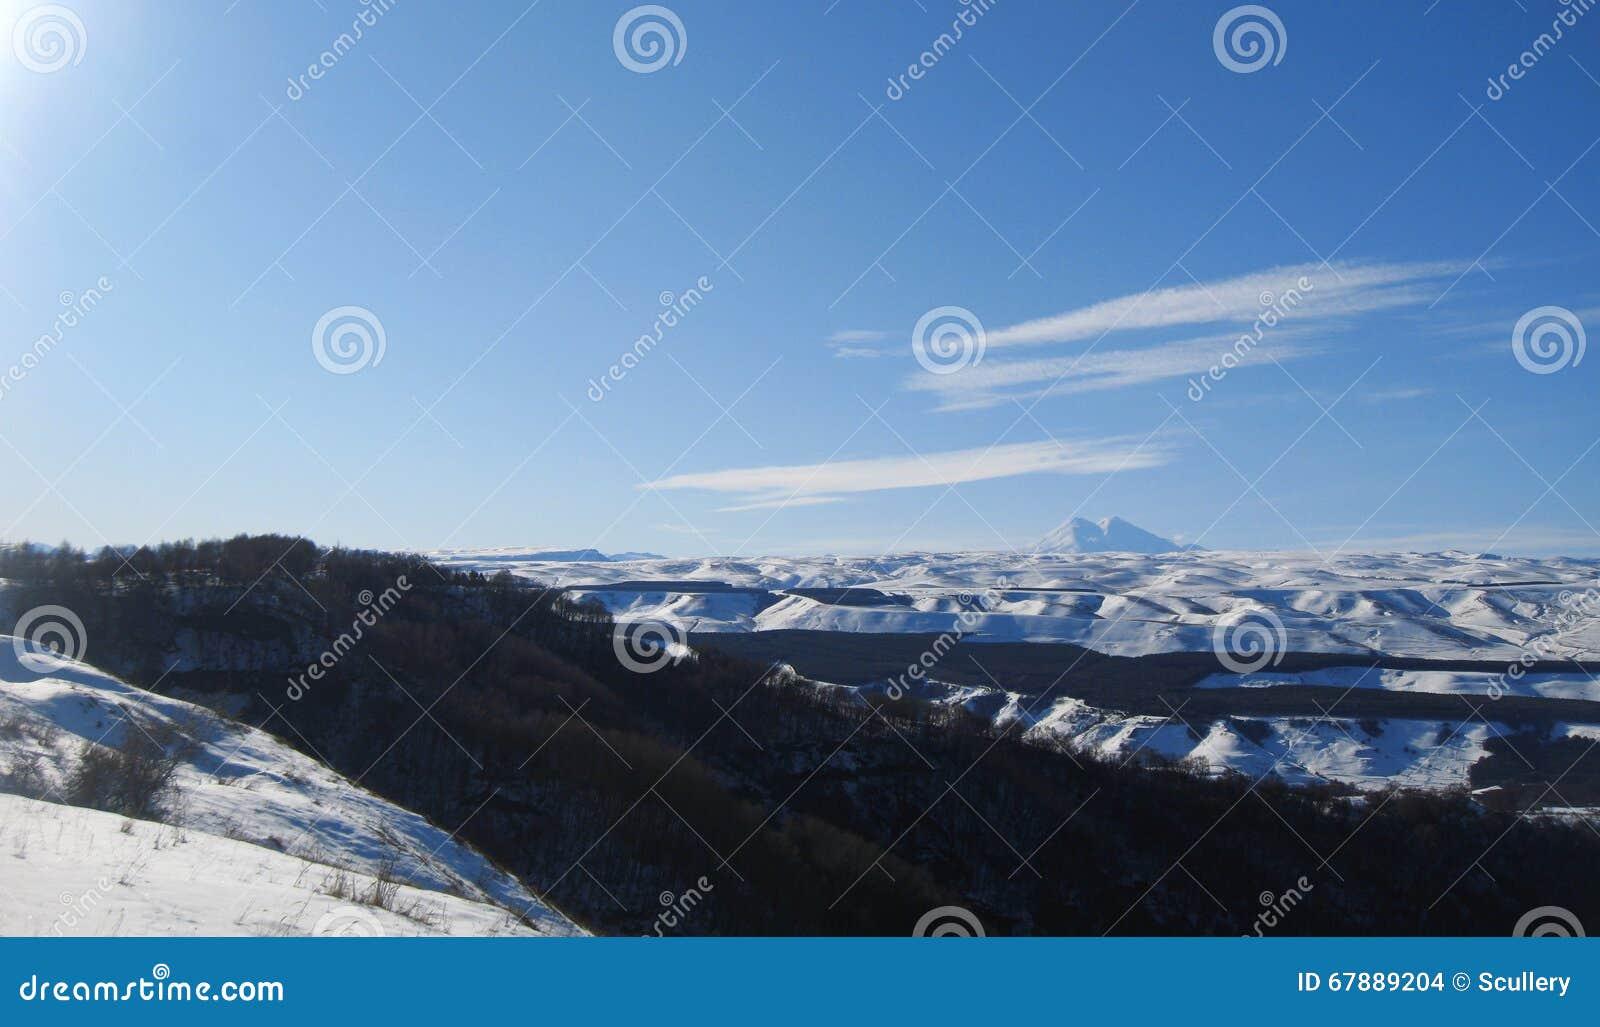 Elbrus山是欧洲高山